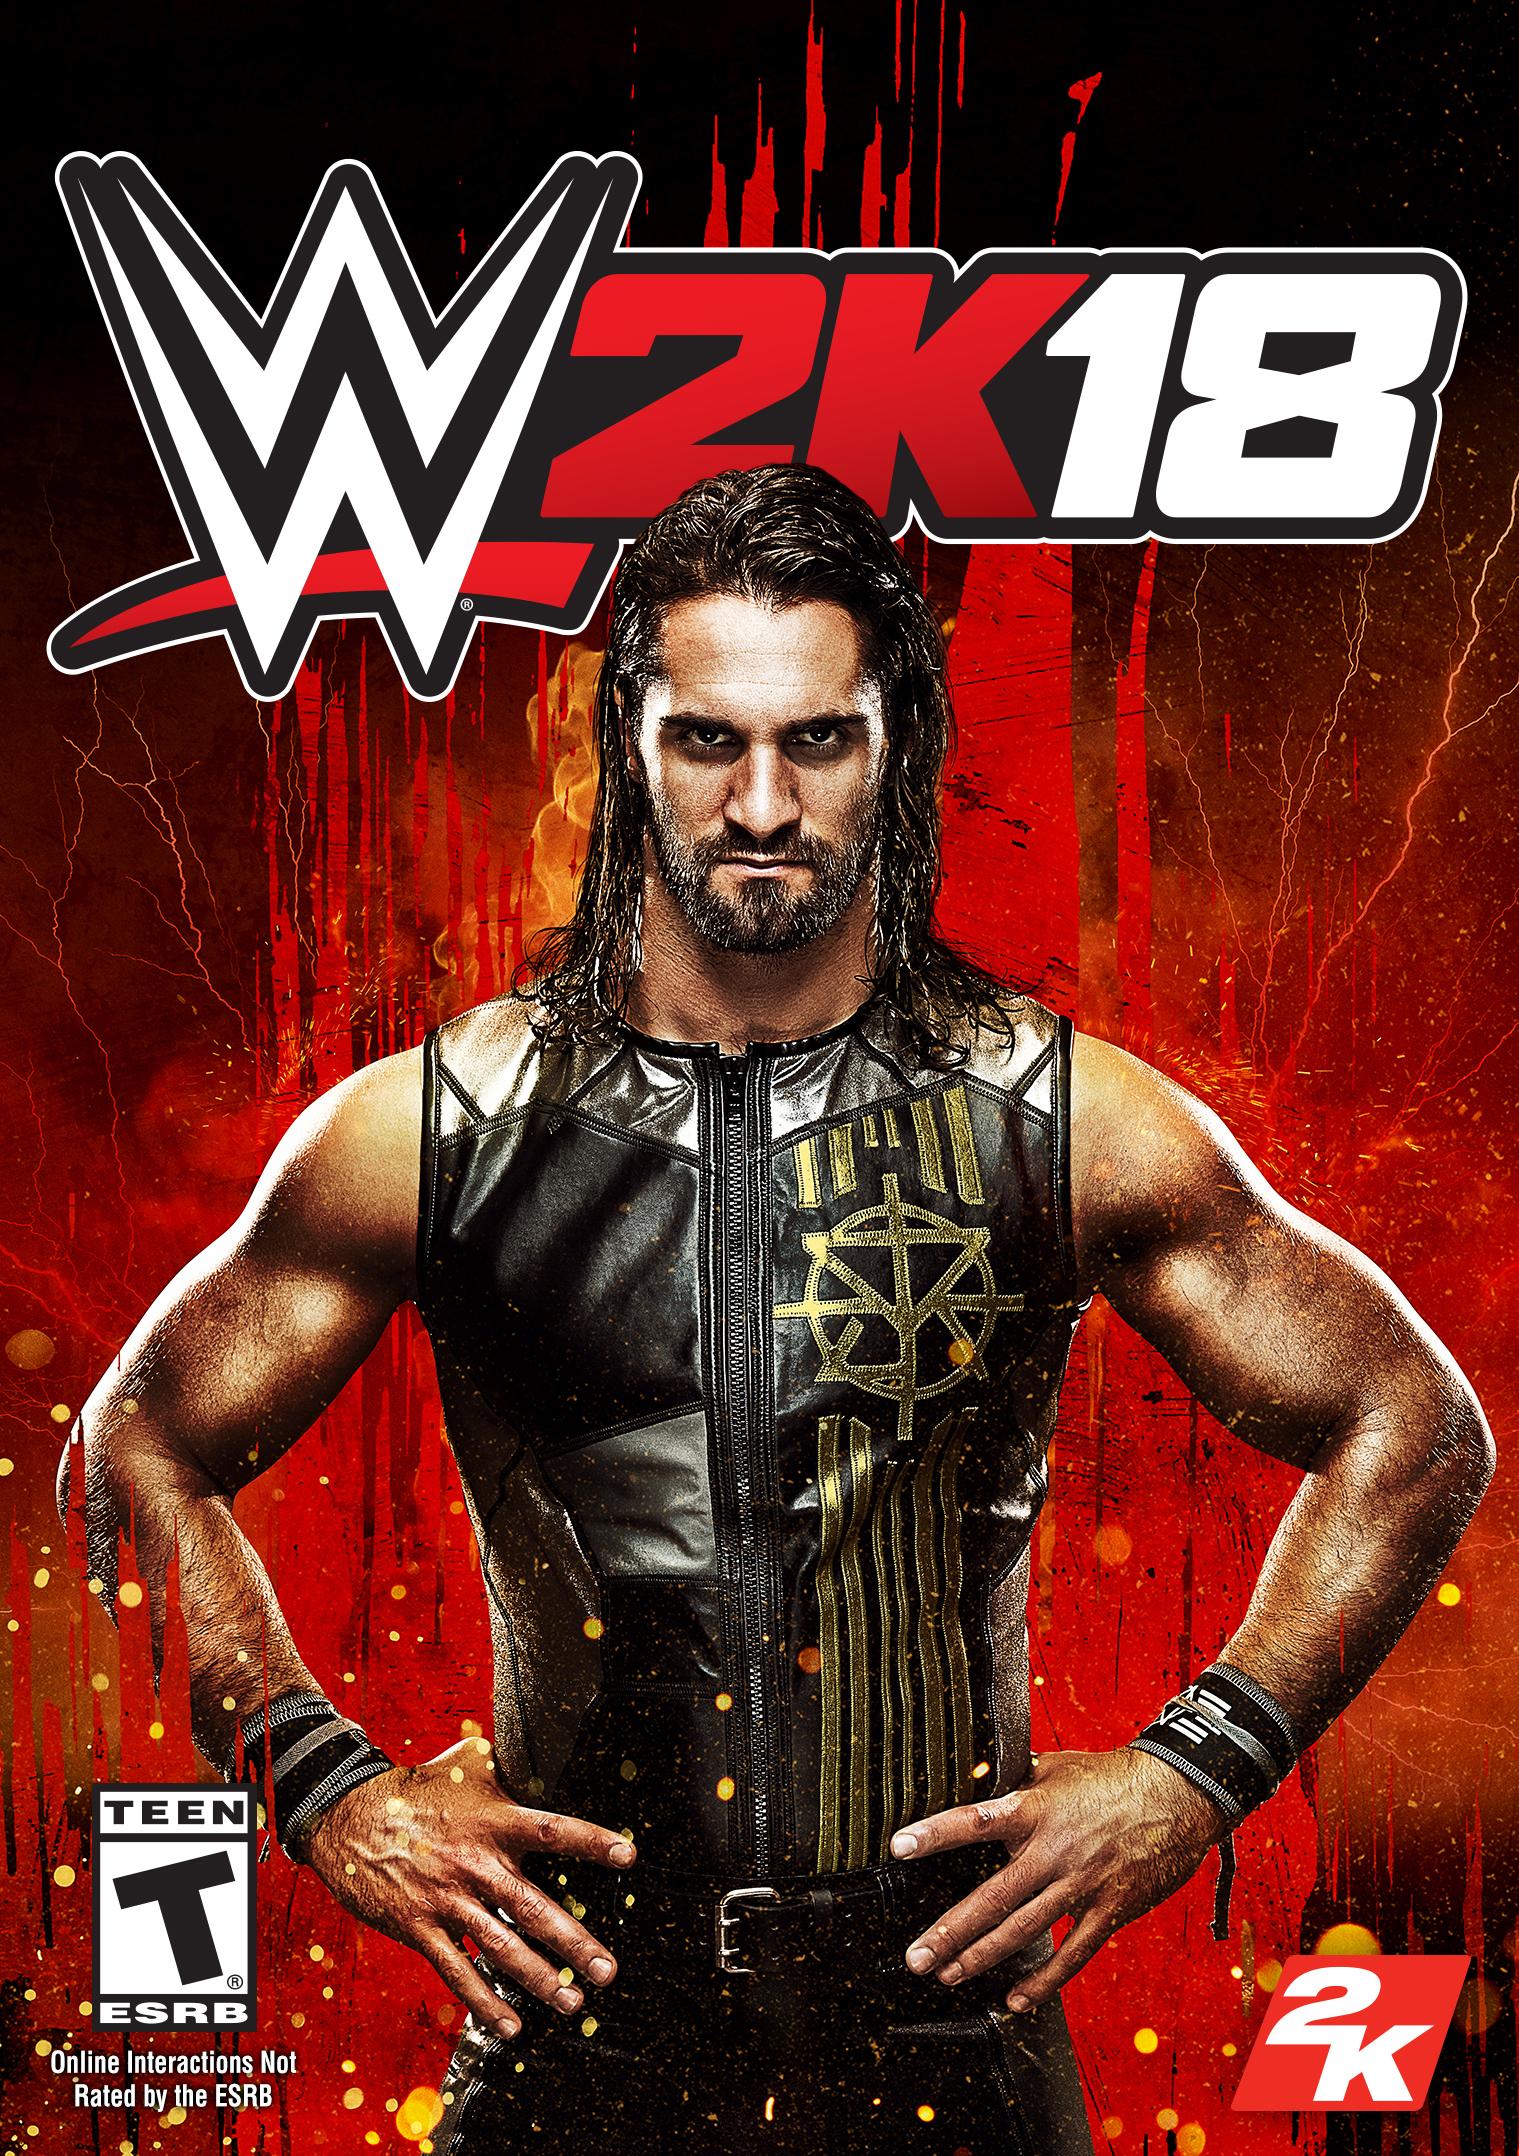 (Corporate Press) alan.lewis@take2games.com or. Access for 2K Josh Kaplan,  415-844-6214 joshk@accesstheagency.com or. WWE Matthew Altman, 203-352-1177